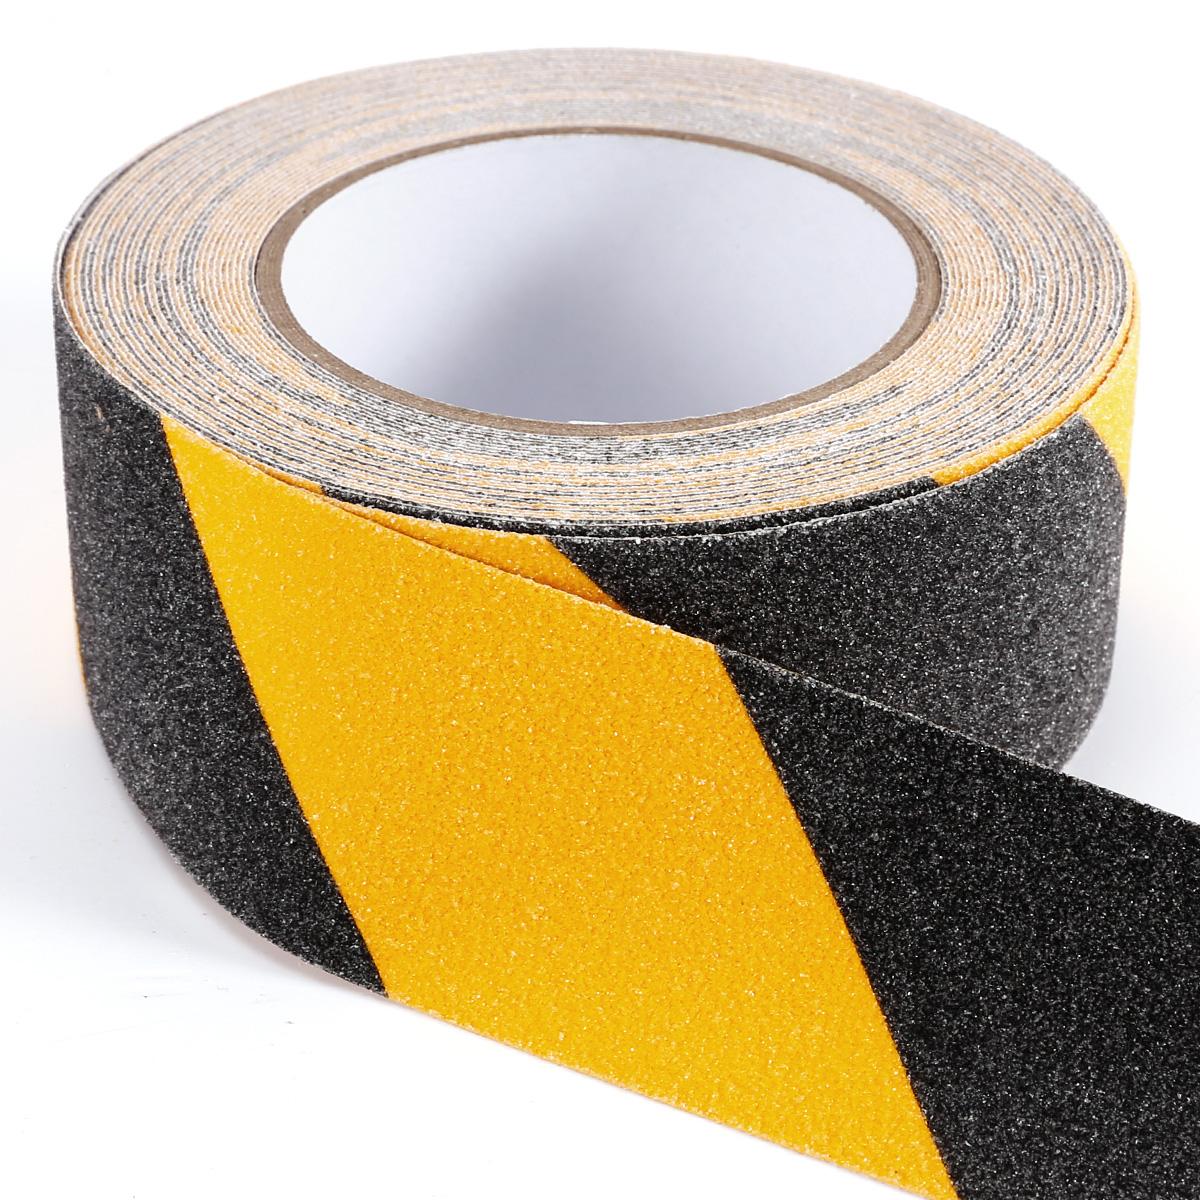 Anti Slip Floor Safety Grooving : Anti slip tape grip adhesive non safety floor step